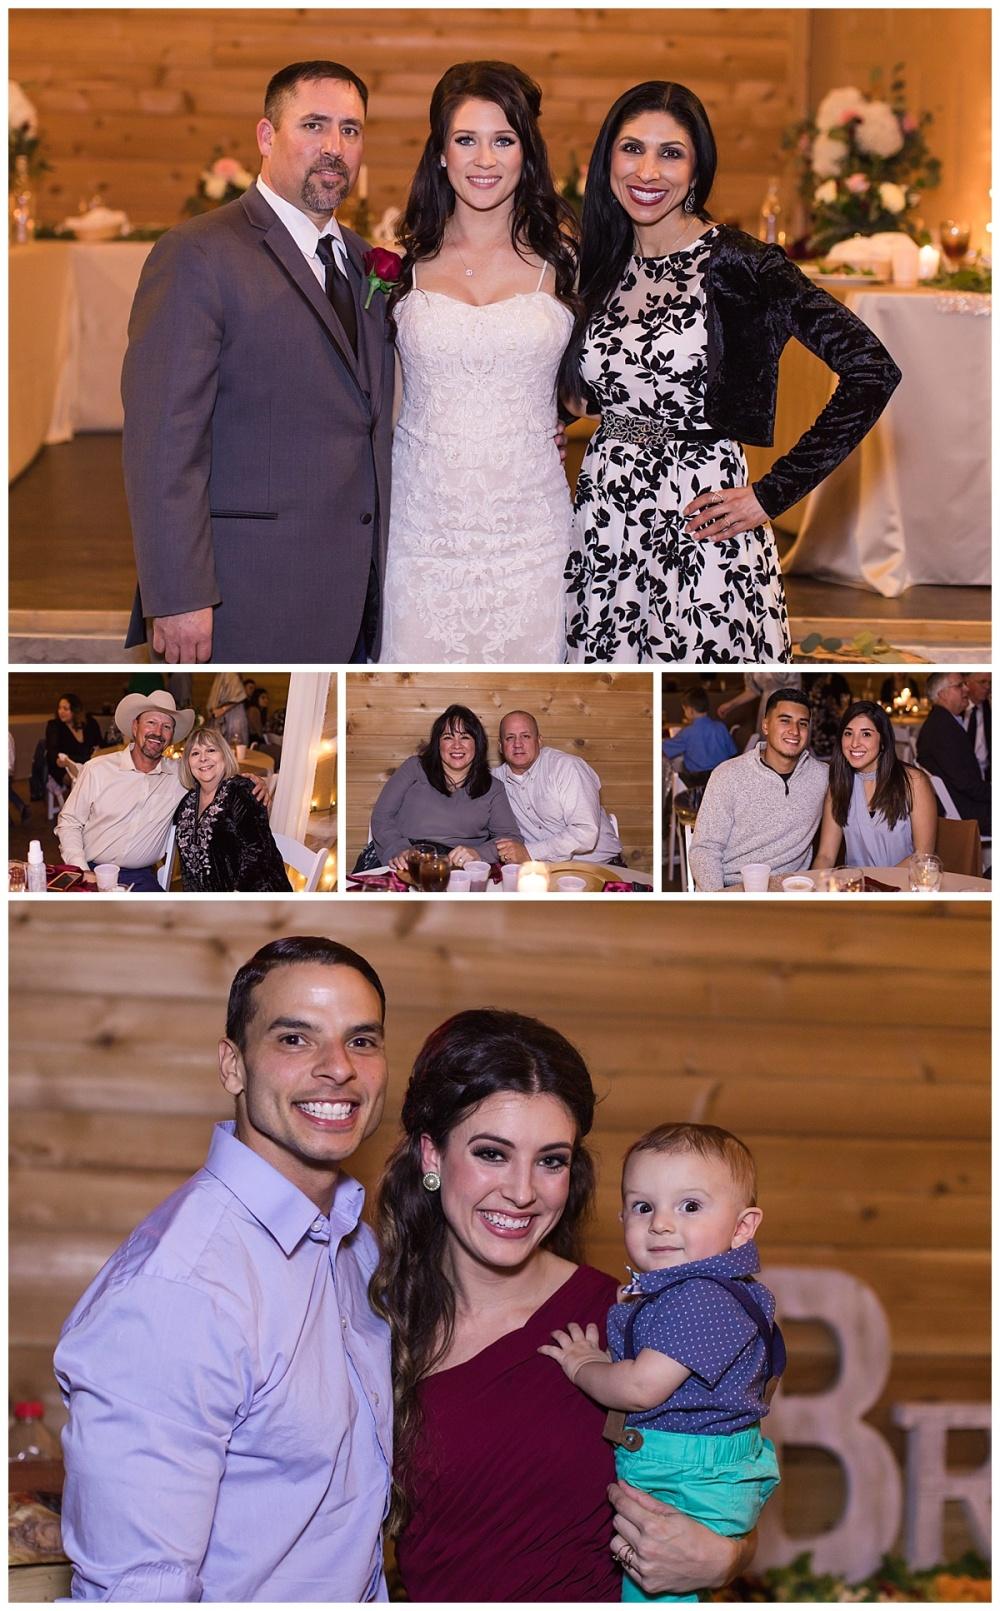 Carly-Barton-Photography-Geronimo-Oaks-Wedding-Venue-Texas-Hill-Country-Ronnie-Sarah_0119.jpg